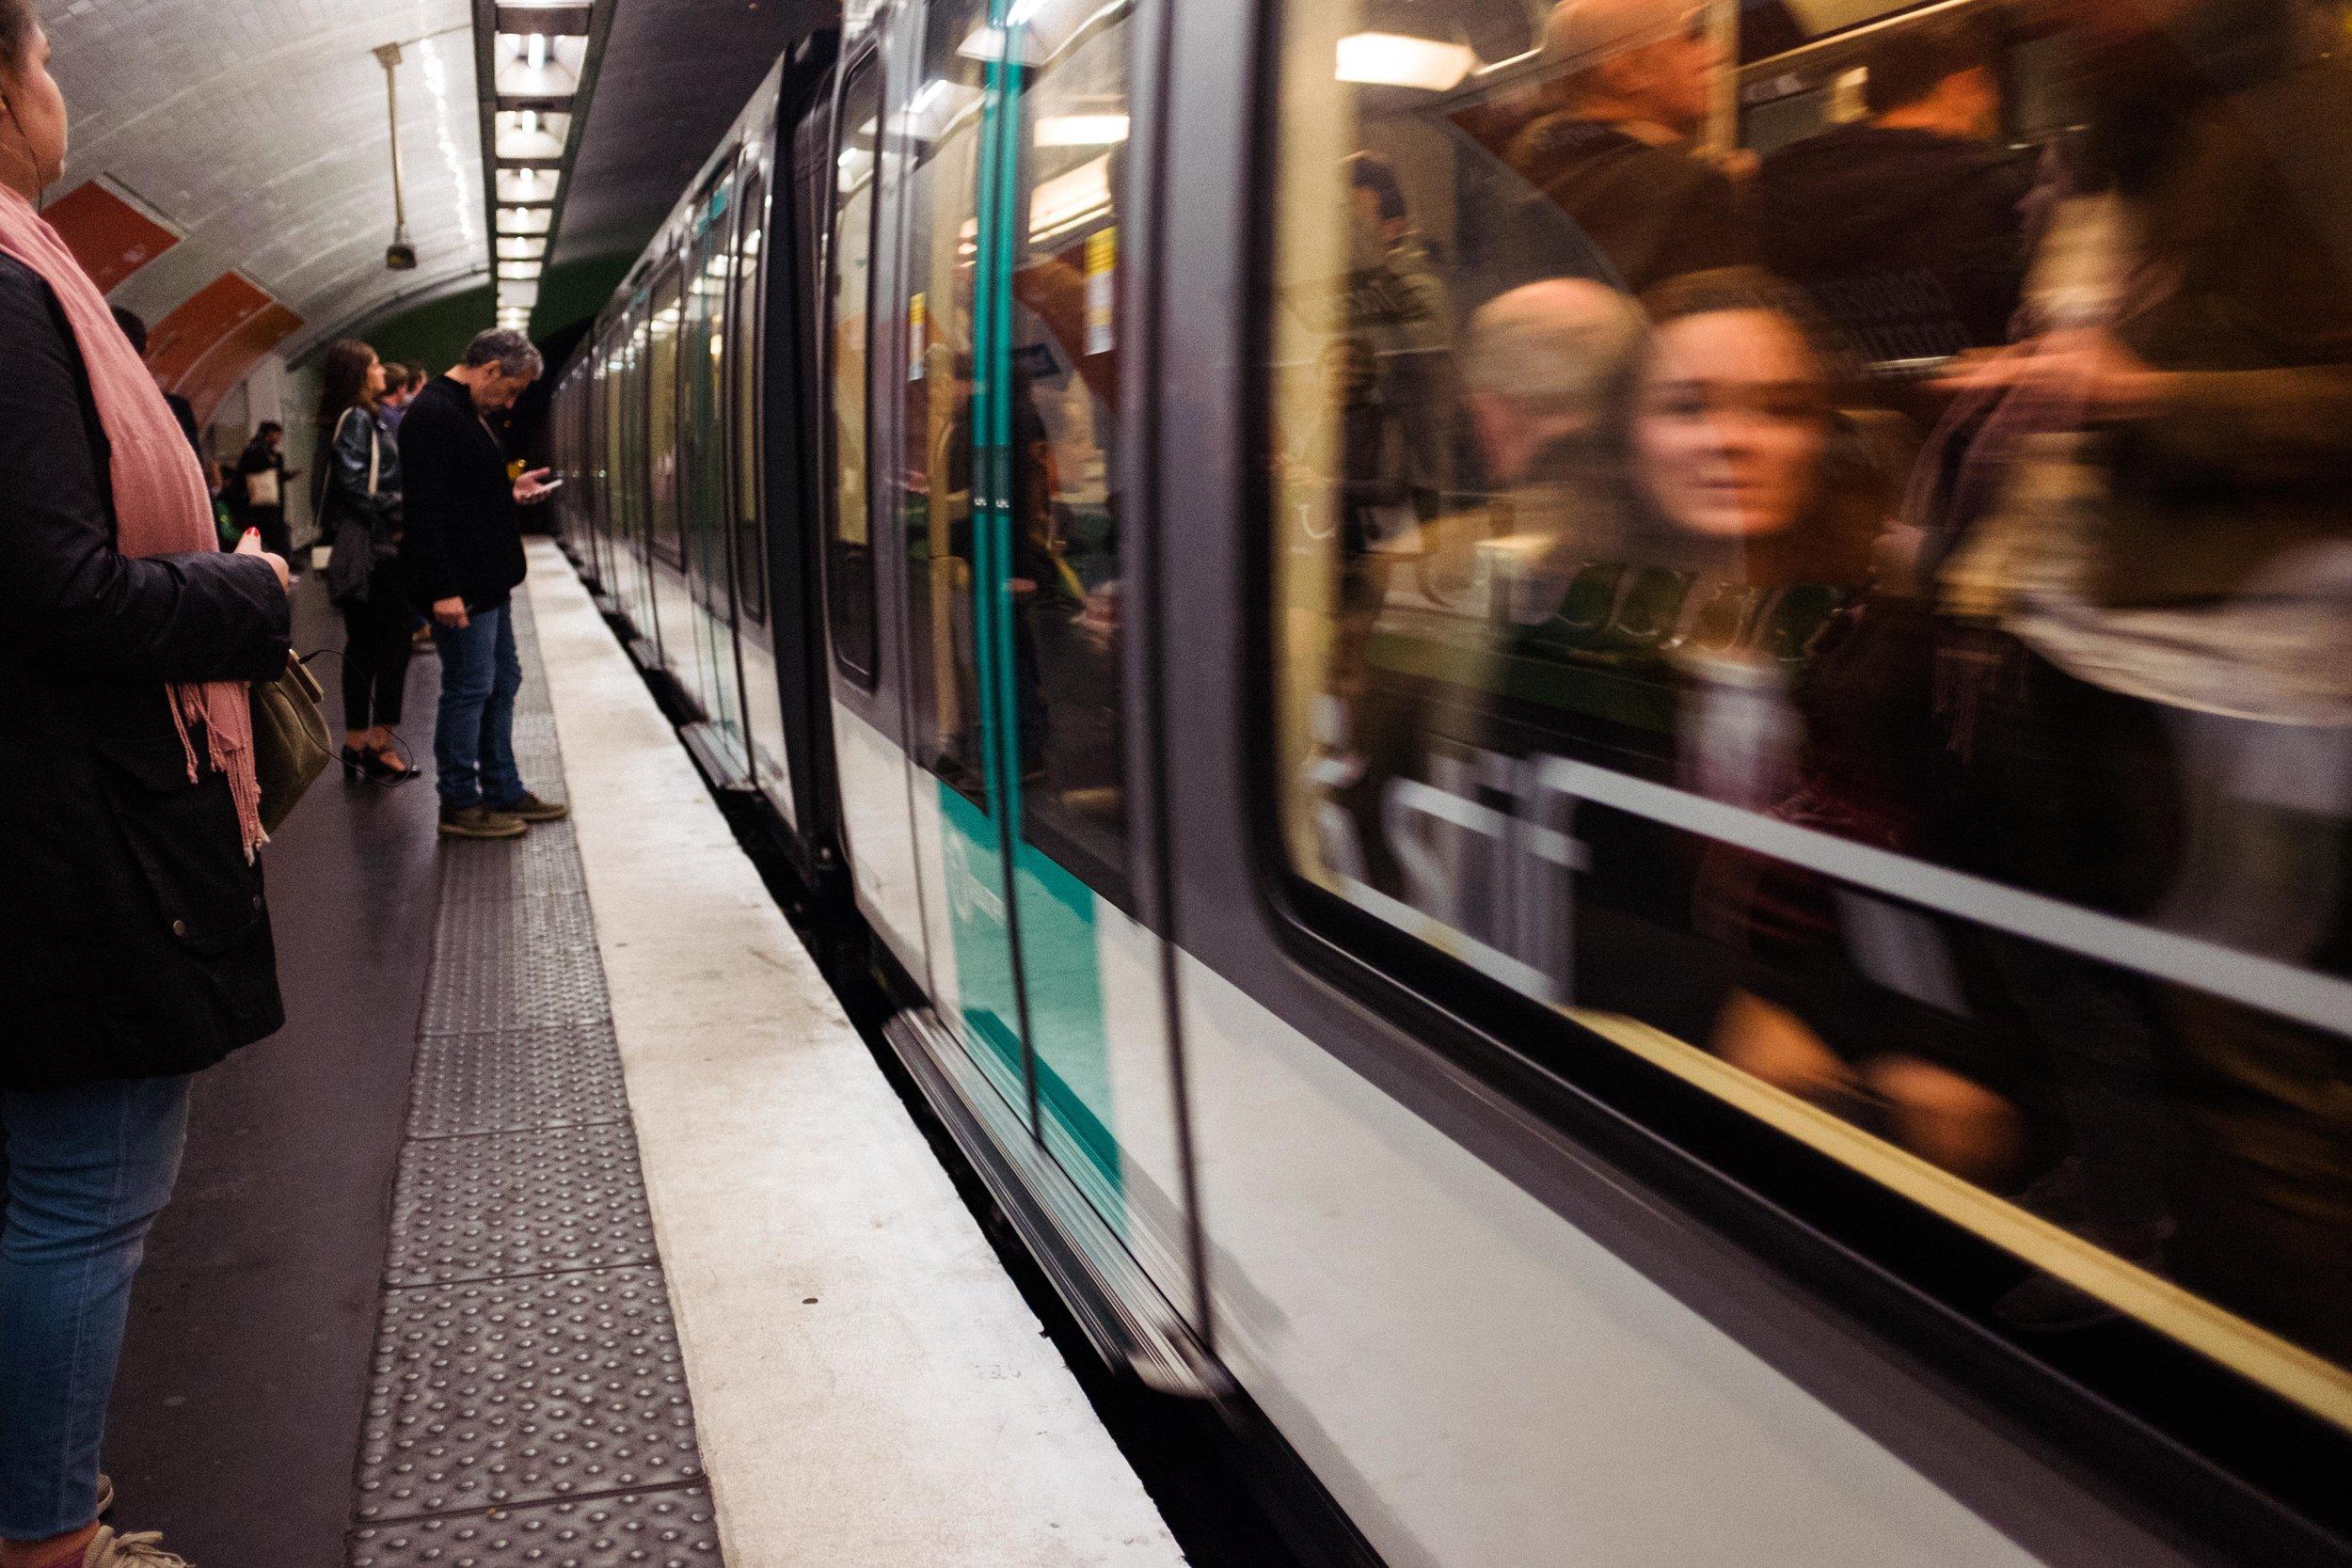 paris-france-metro-woman-smiling